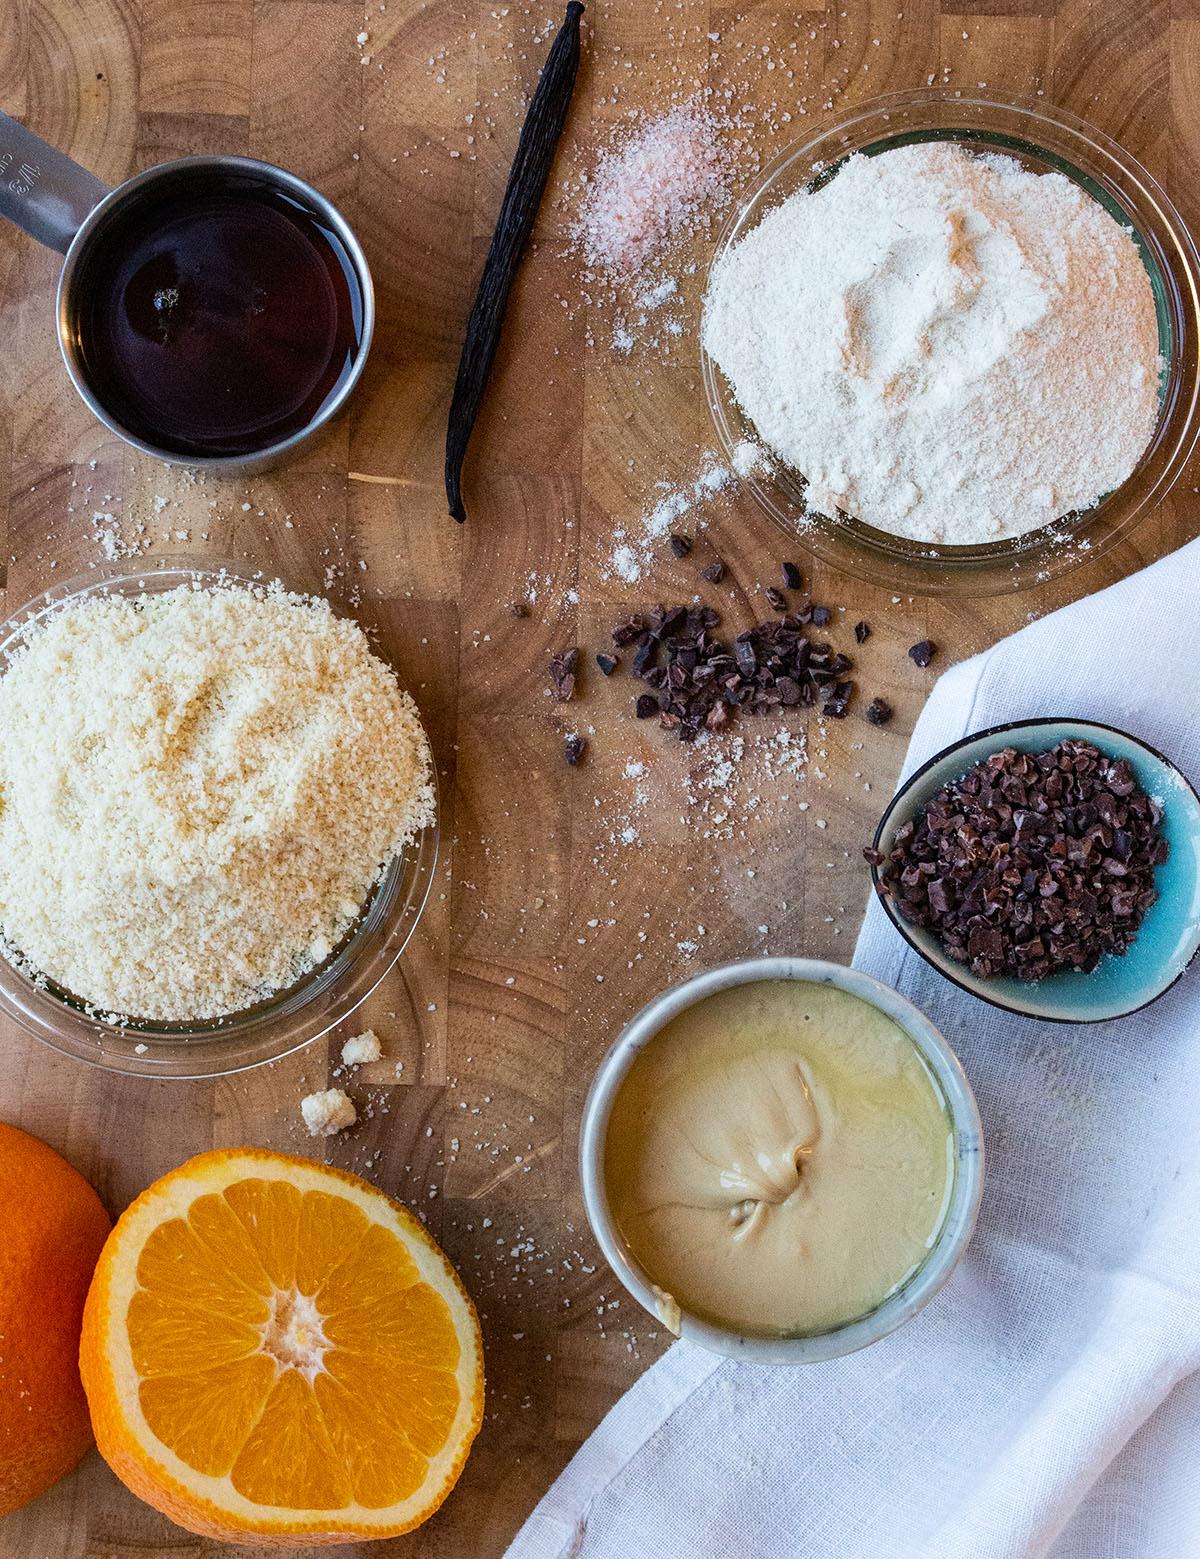 ingredients chocolate Cookies vegan maple syrup, almond flour, Rice flour, vanilla bean, pink salt, orange, Cashew butter